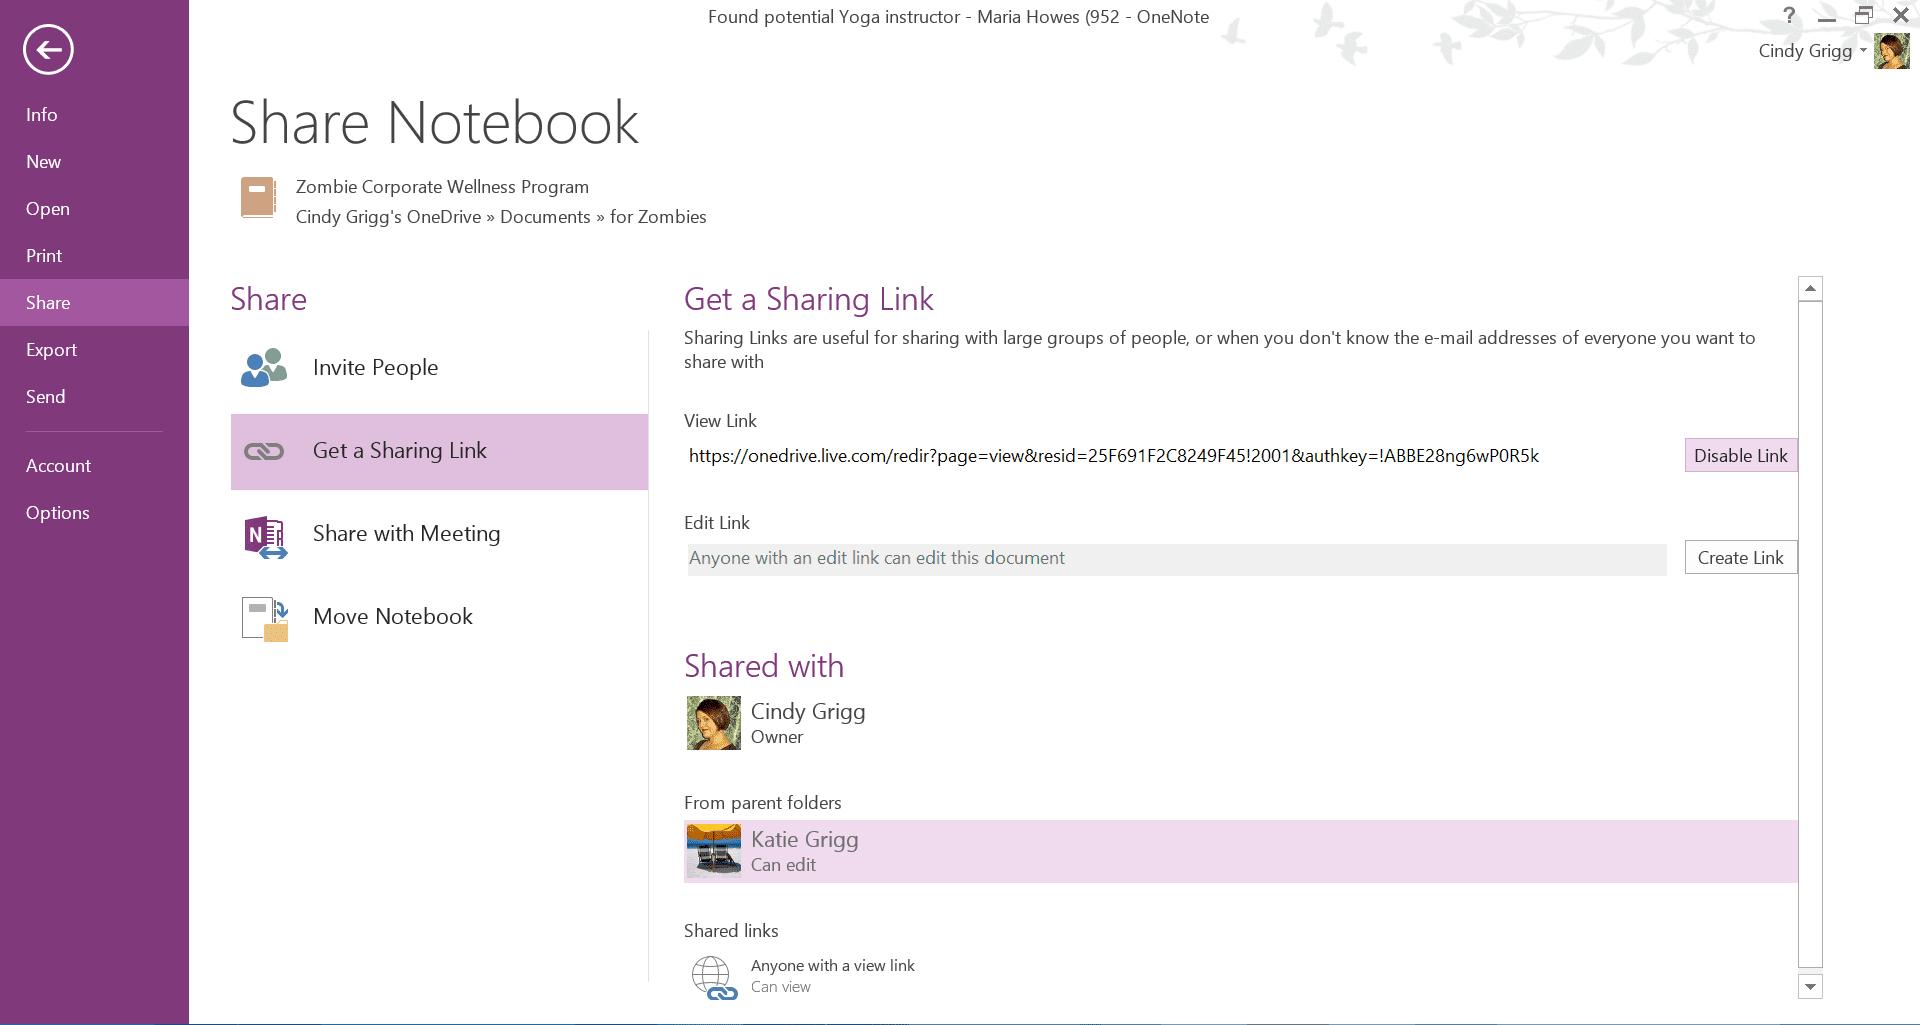 Disabling notebook sharing